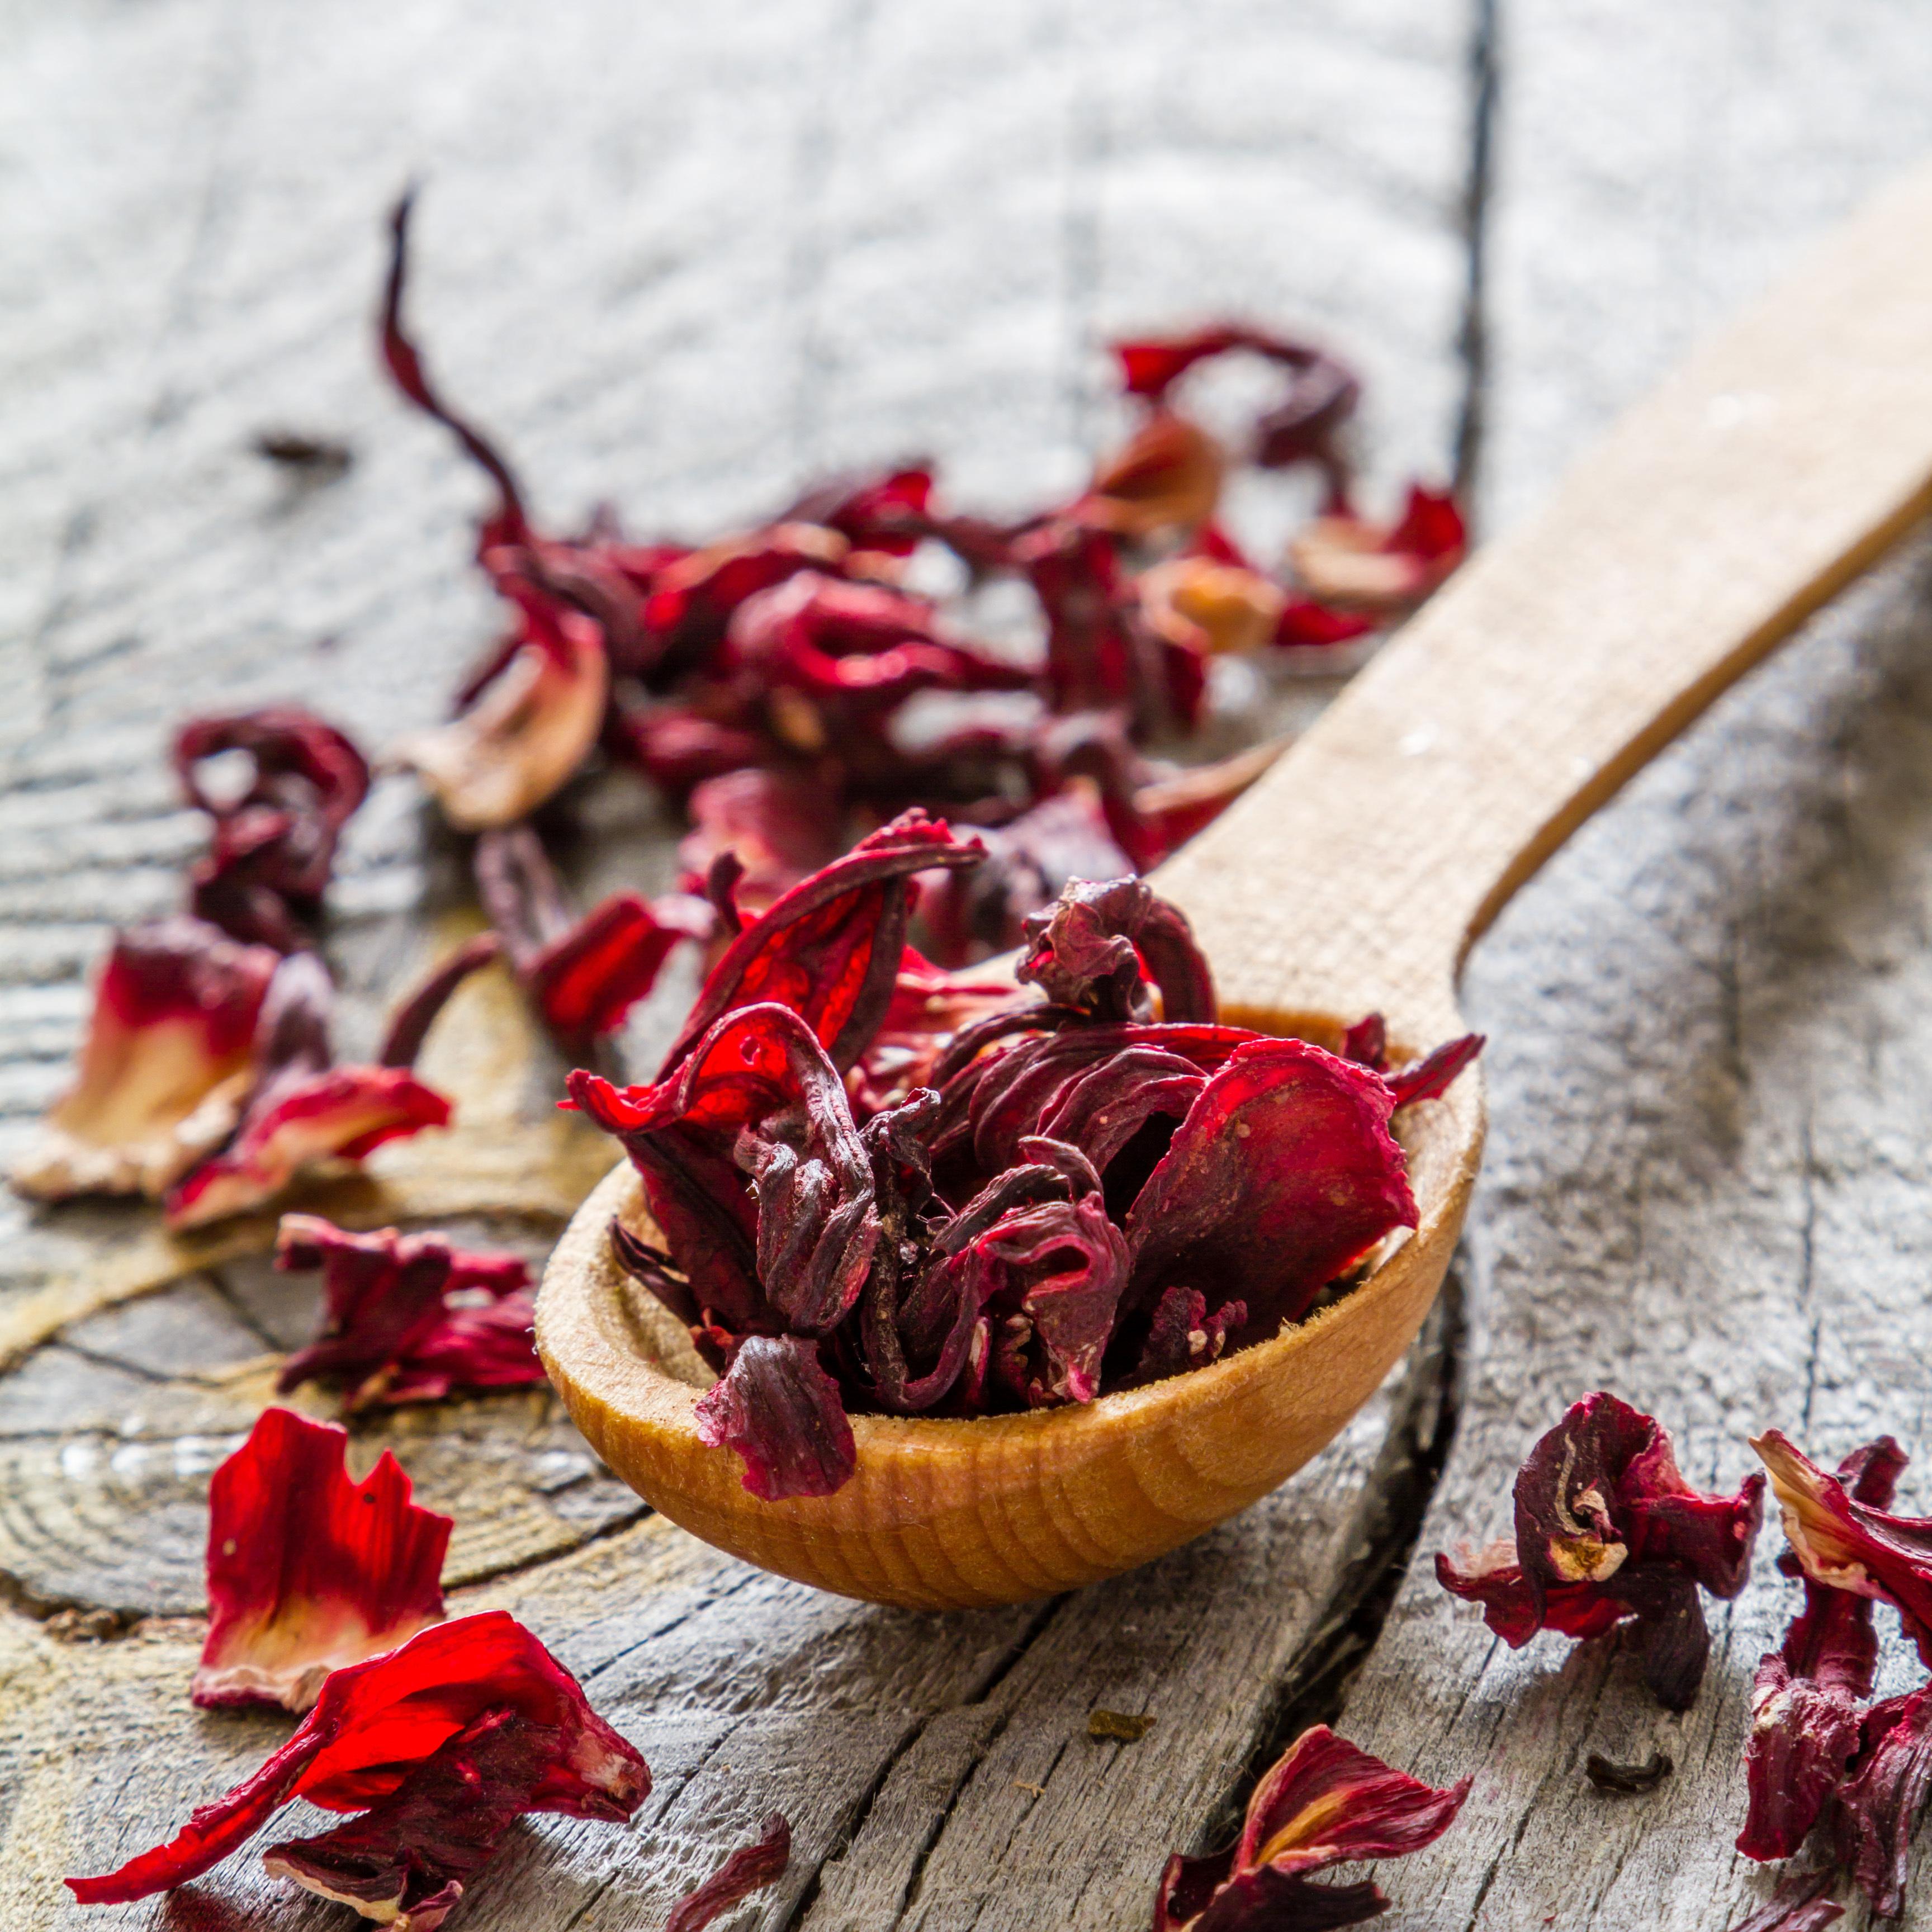 Les ingrédients - hibiscus